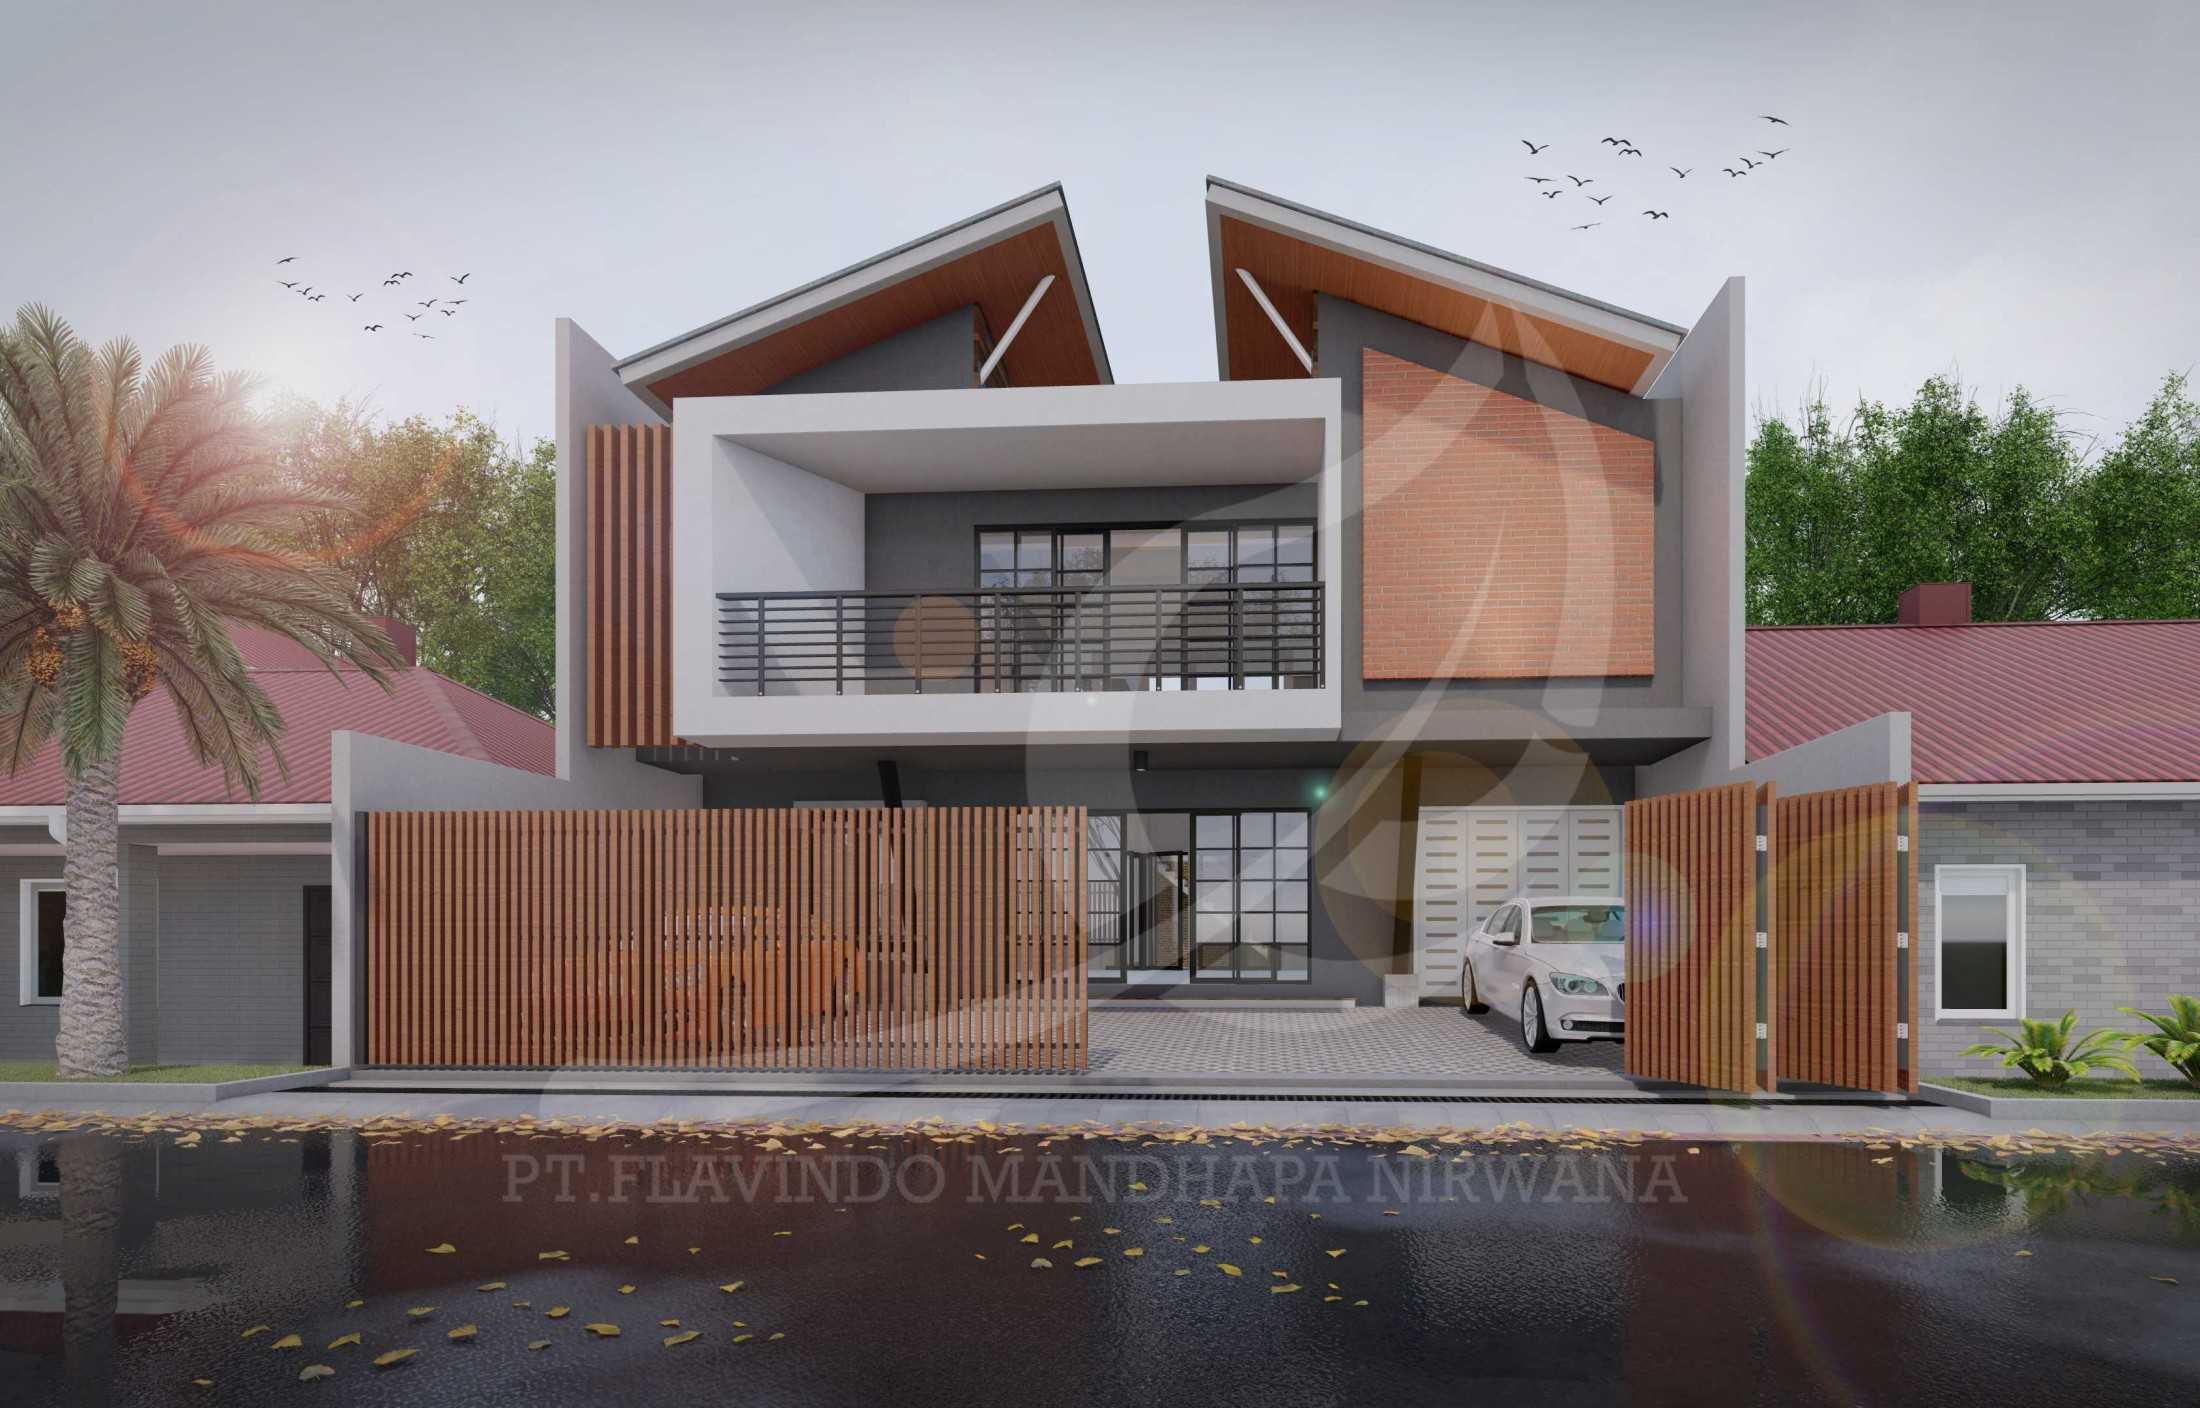 Flav Arsitek Mrs.yuli Boarding House Malang, Kota Malang, Jawa Timur, Indonesia Malang, Kota Malang, Jawa Timur, Indonesia Flav-Arsitek-Mrsyuli-Boarding-House  113855